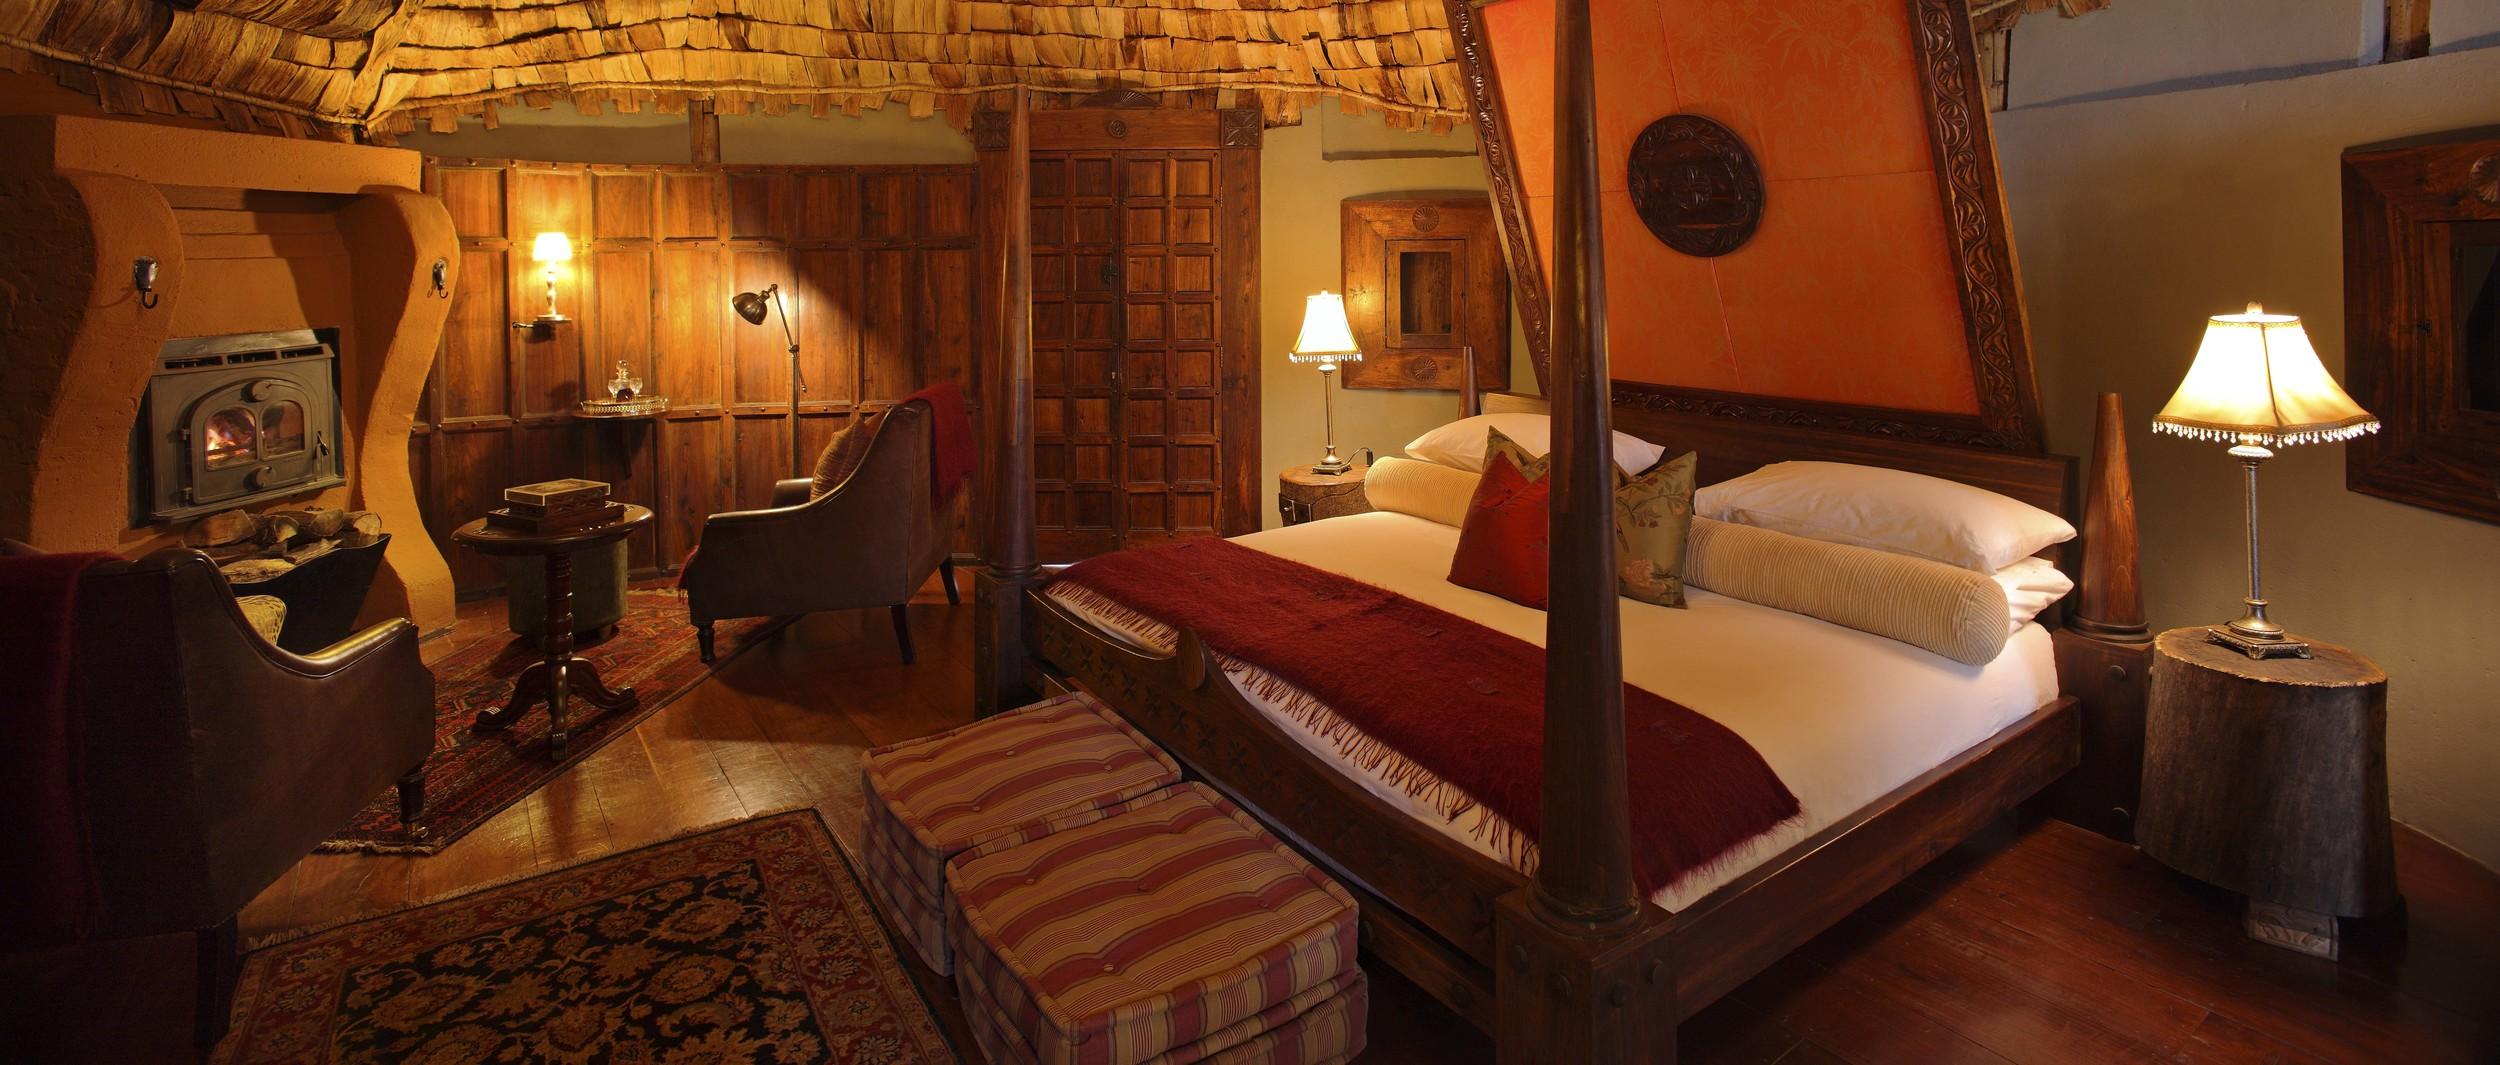 Ngorongoro_crater_lodge_guestroom9.jpg